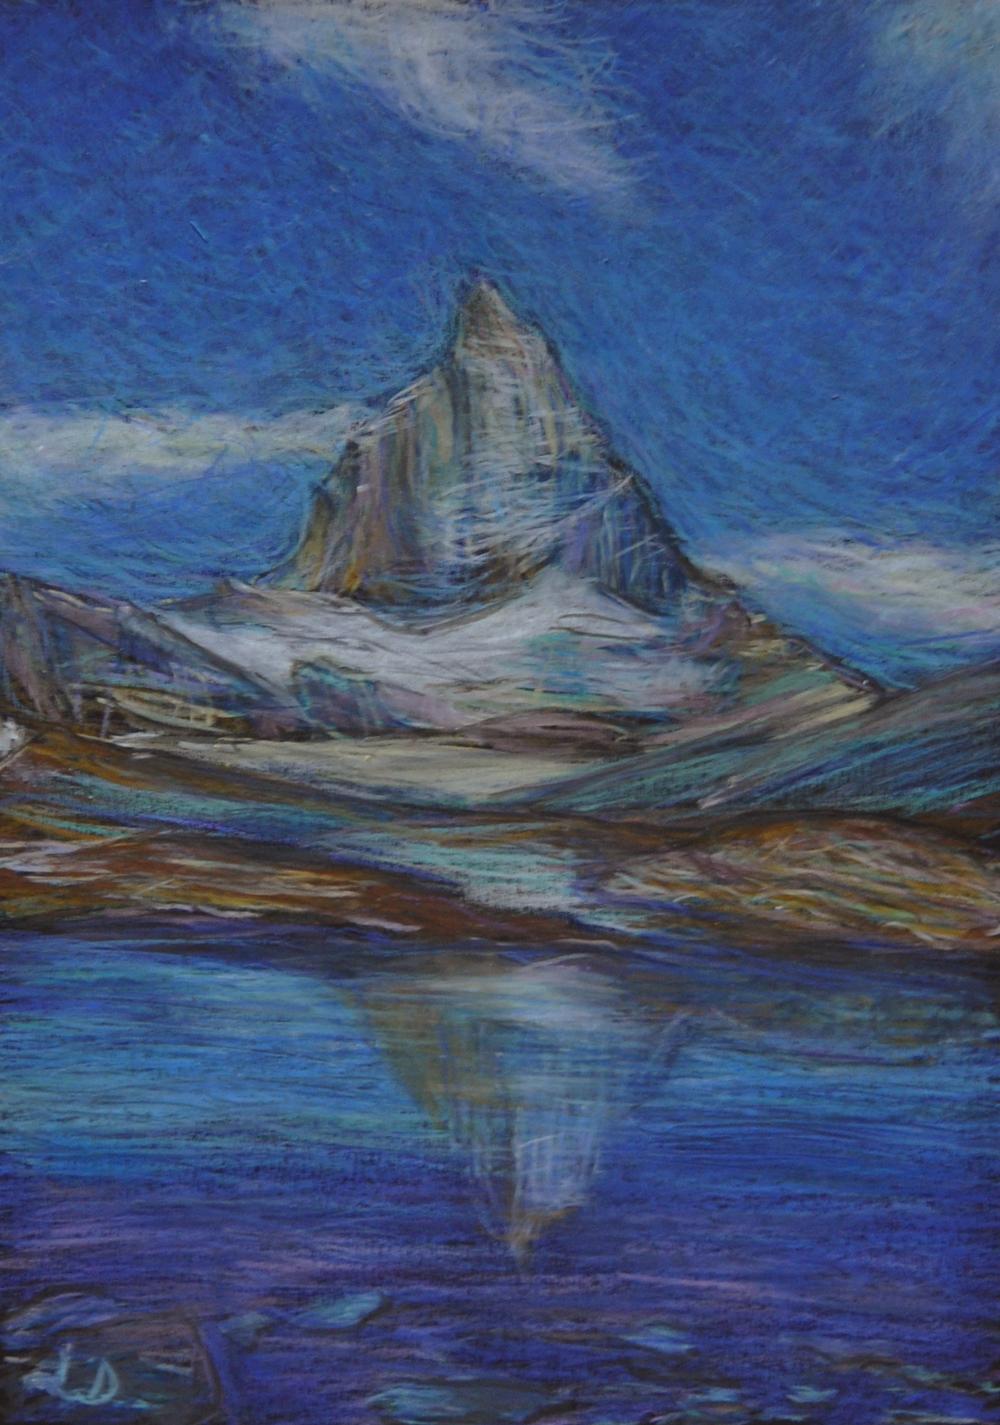 Matterhorn, from Trockener Steg.  Mixed media on paper, 30x20, 2018